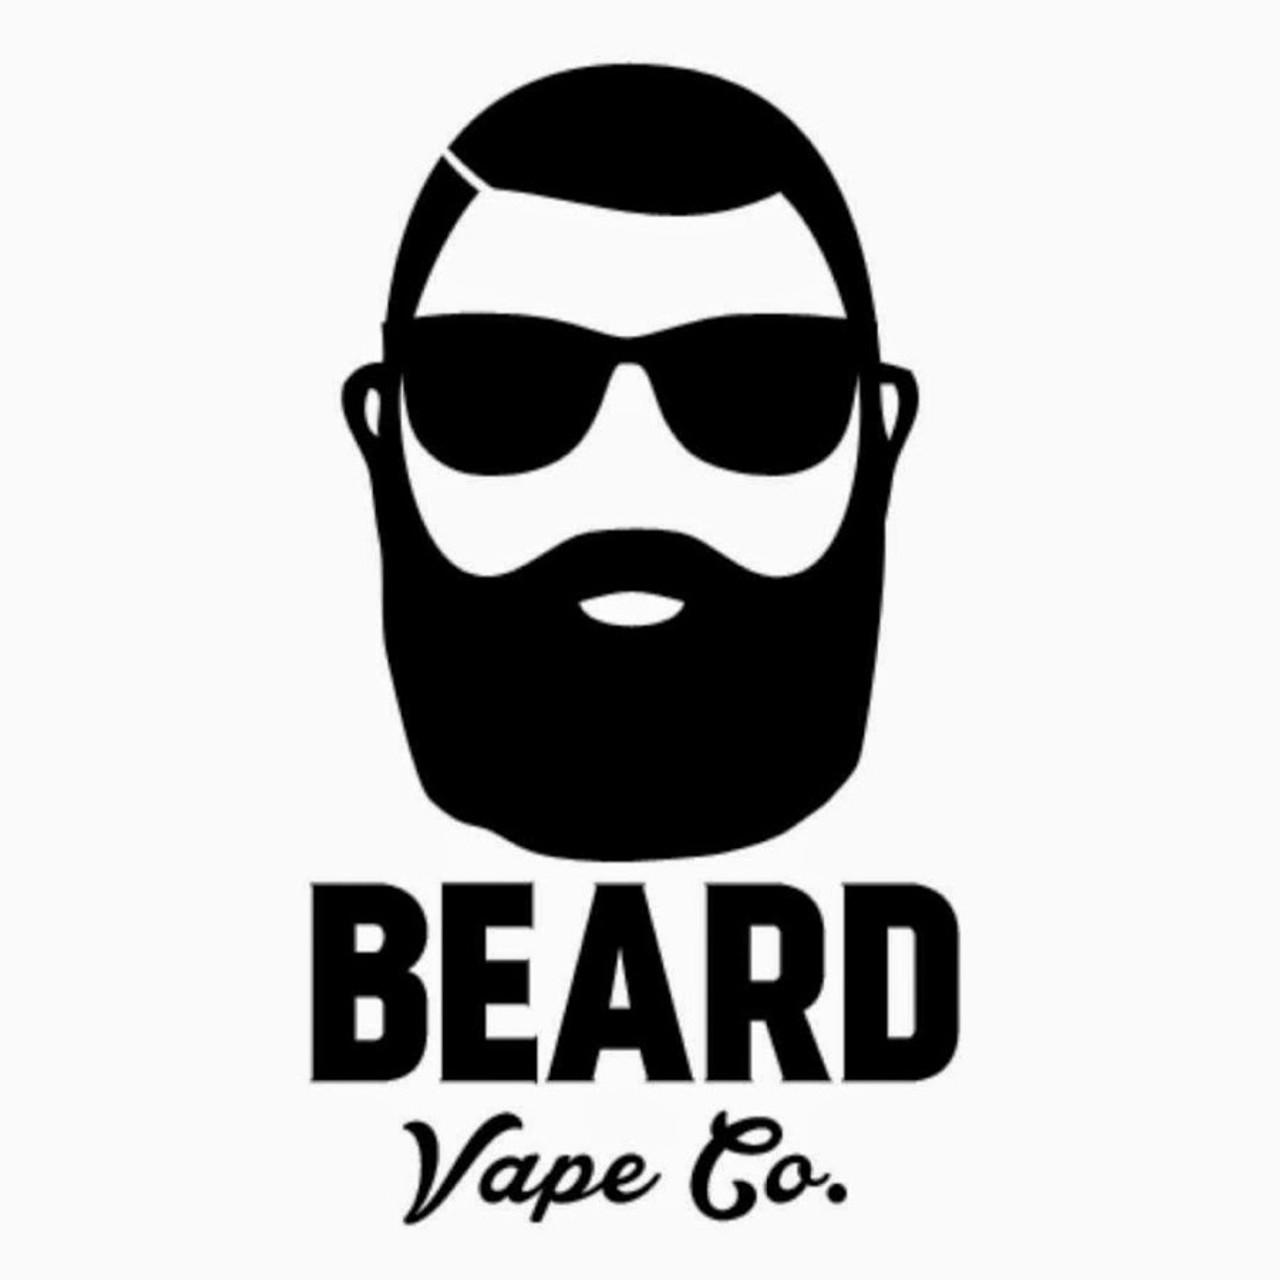 Beard Vape Co. | Vapecentric